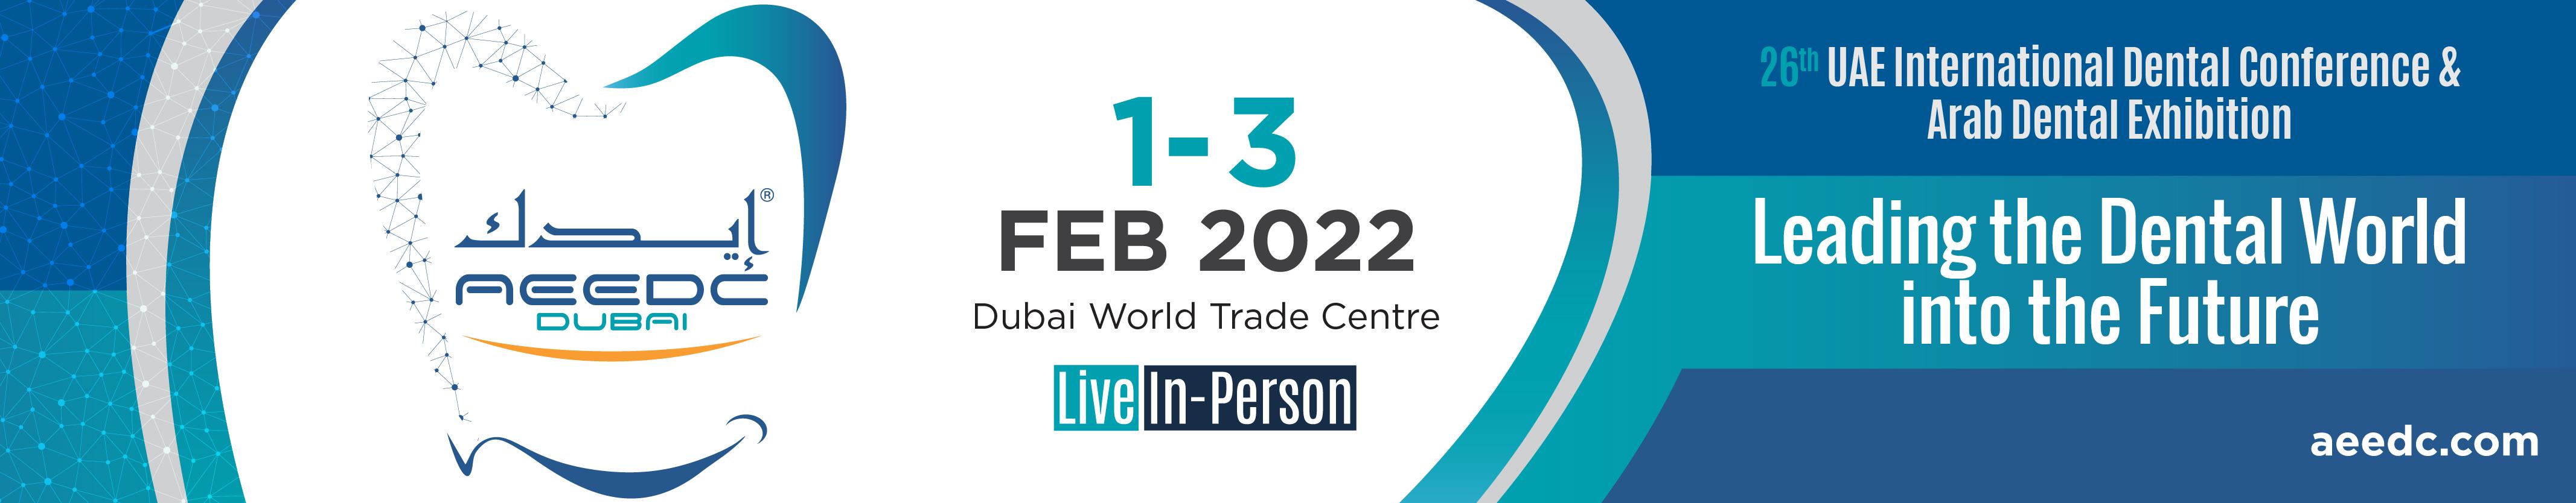 AEEDC Dubai 2022